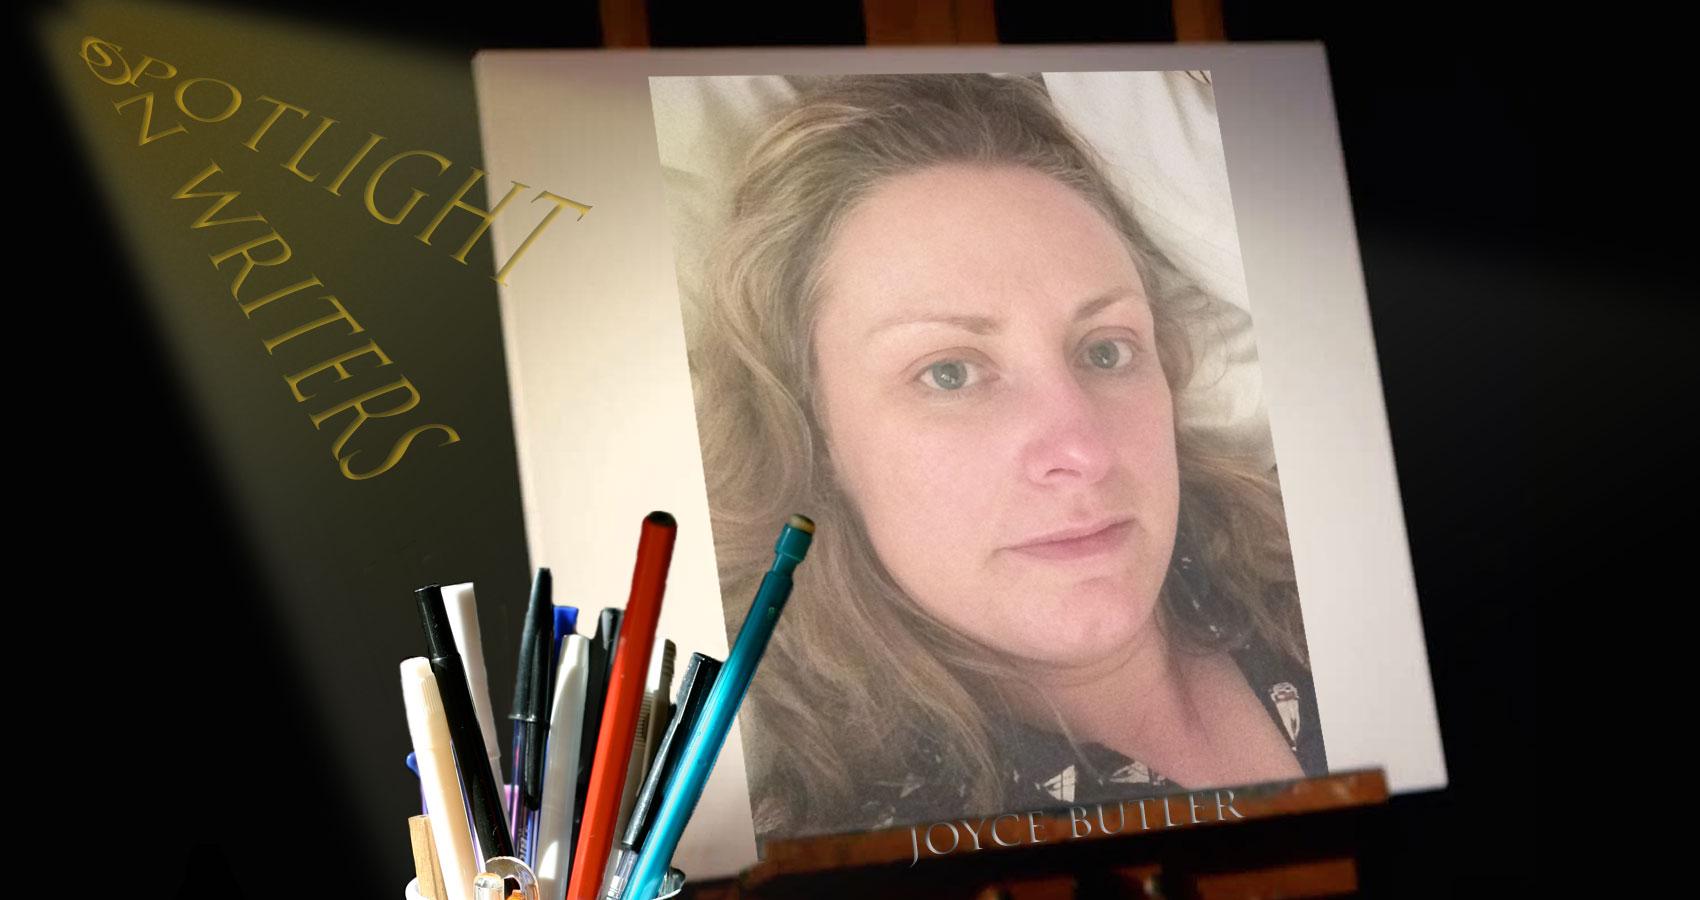 Spotlight On Writers - Joyce Butler at Spillwords.com